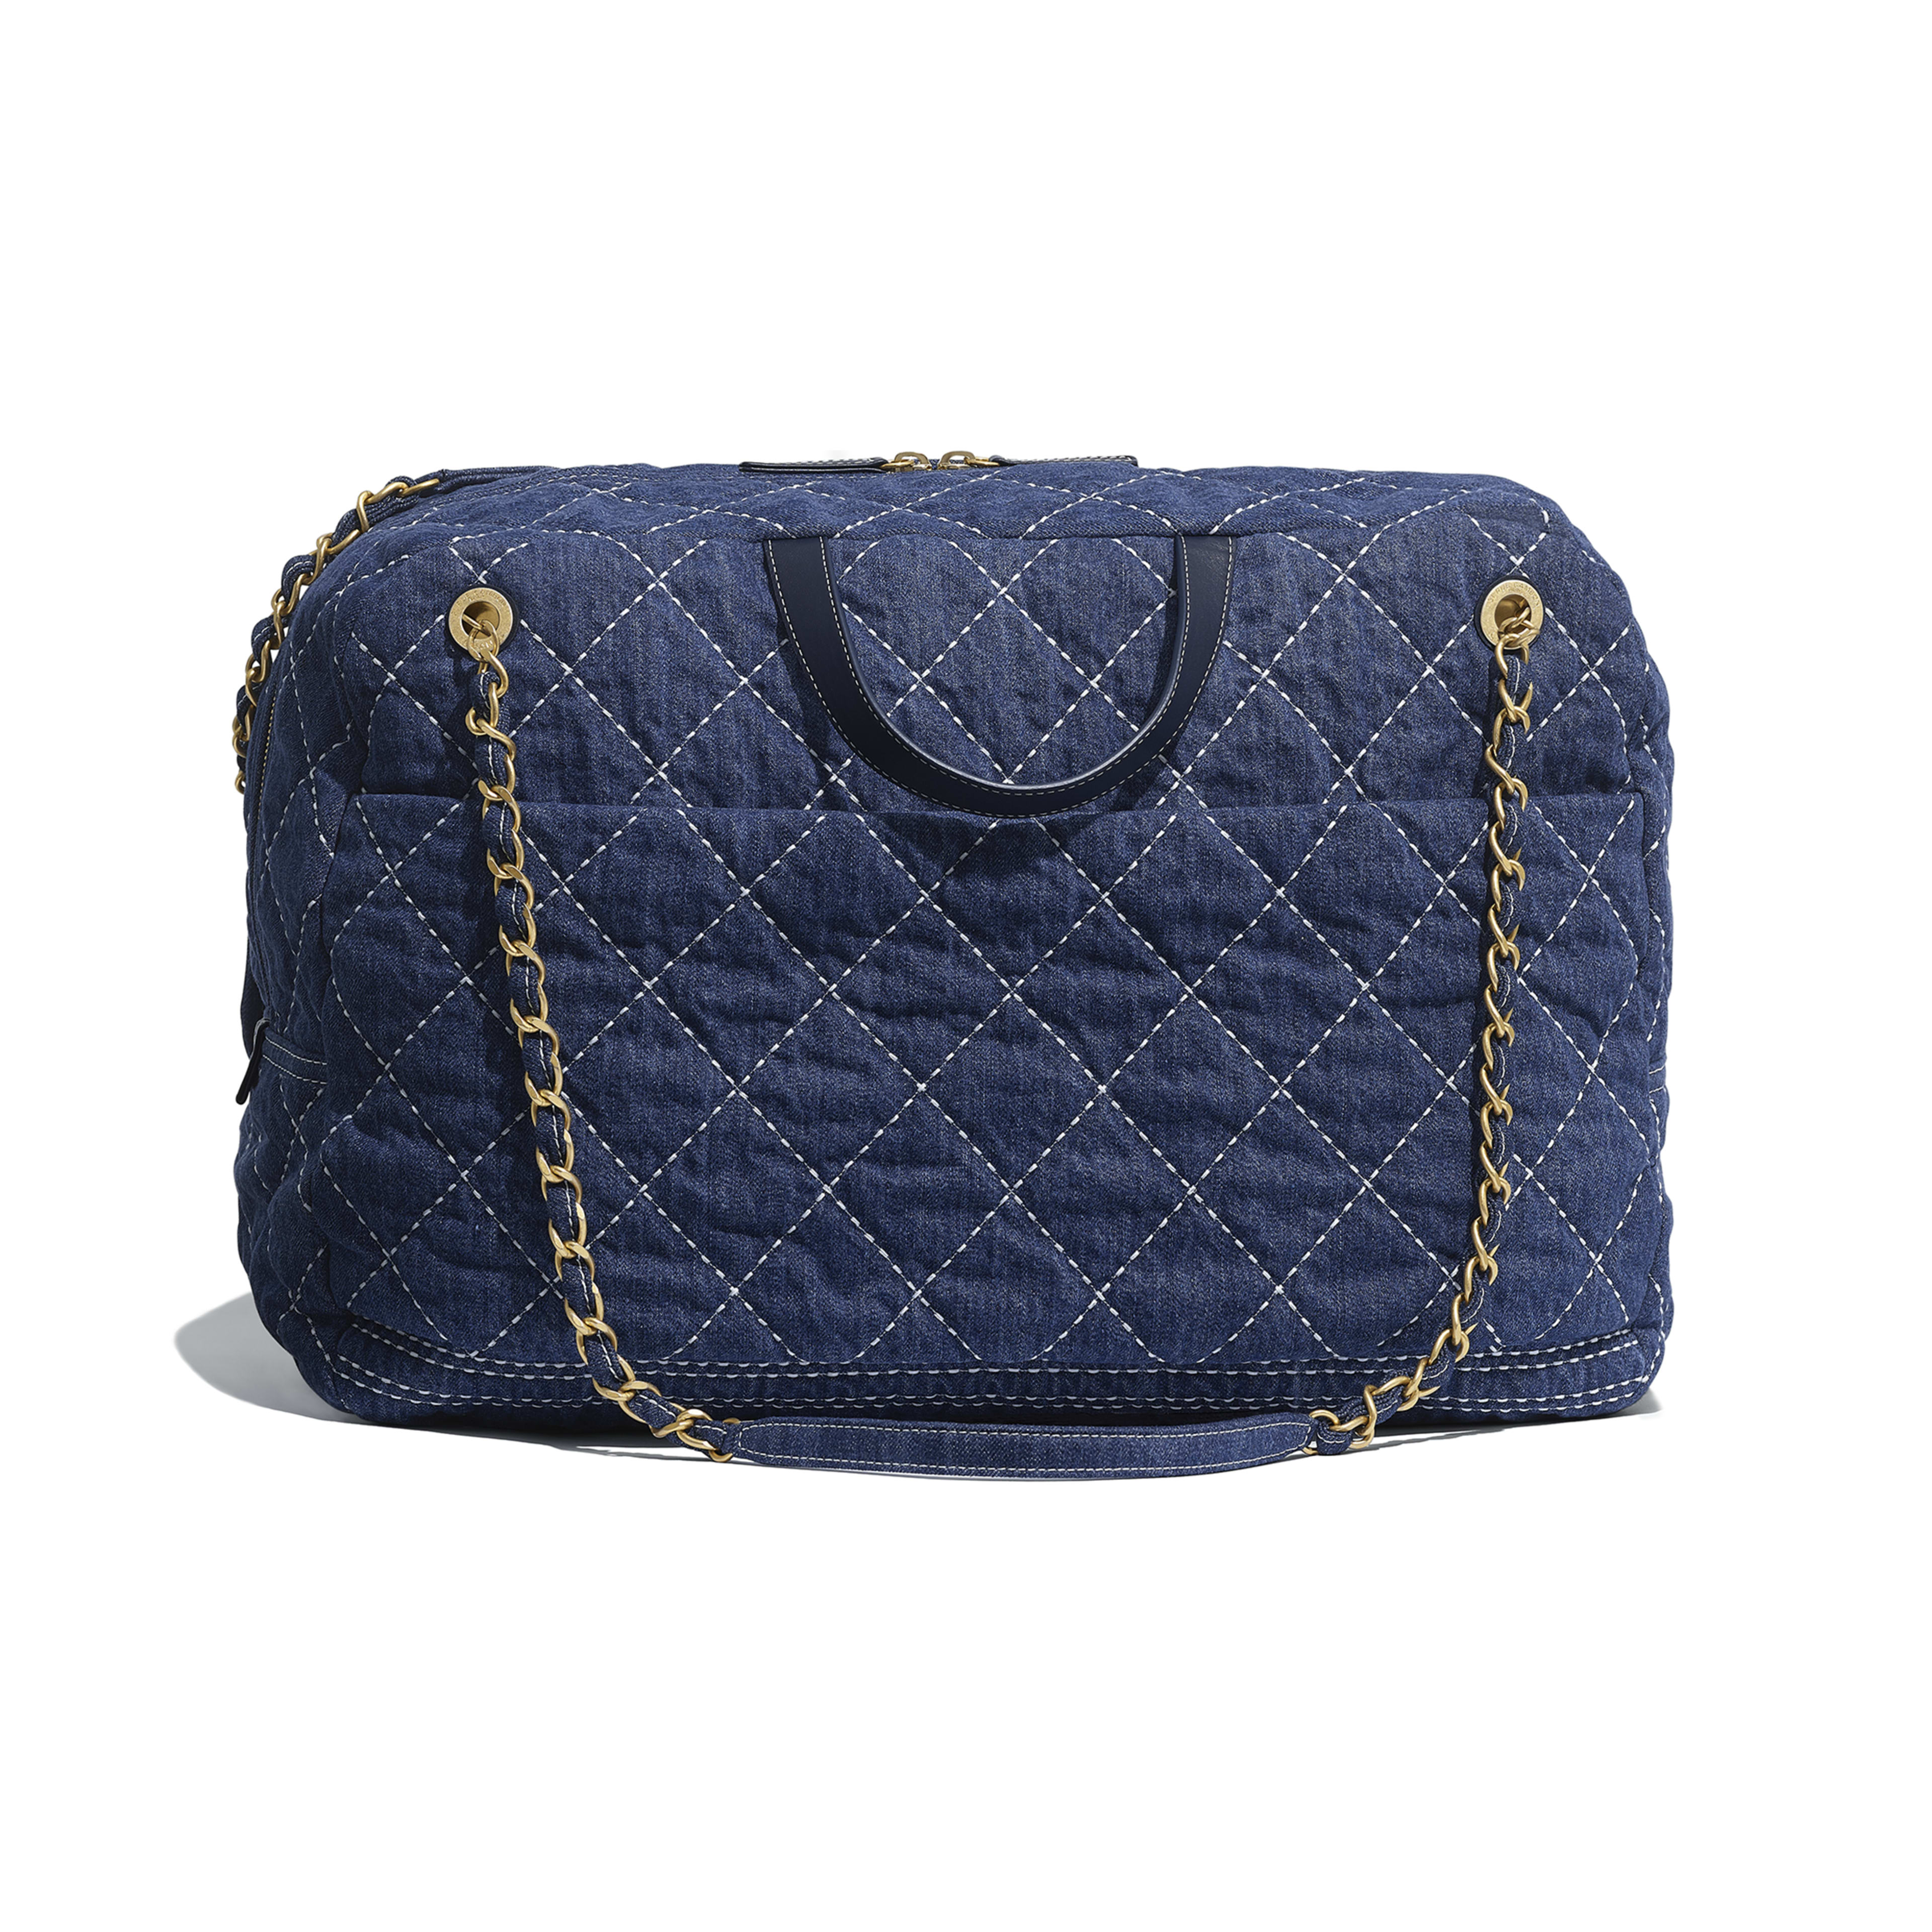 Denim Gold Tone Metal Blue Large Bowling Bag Chanel